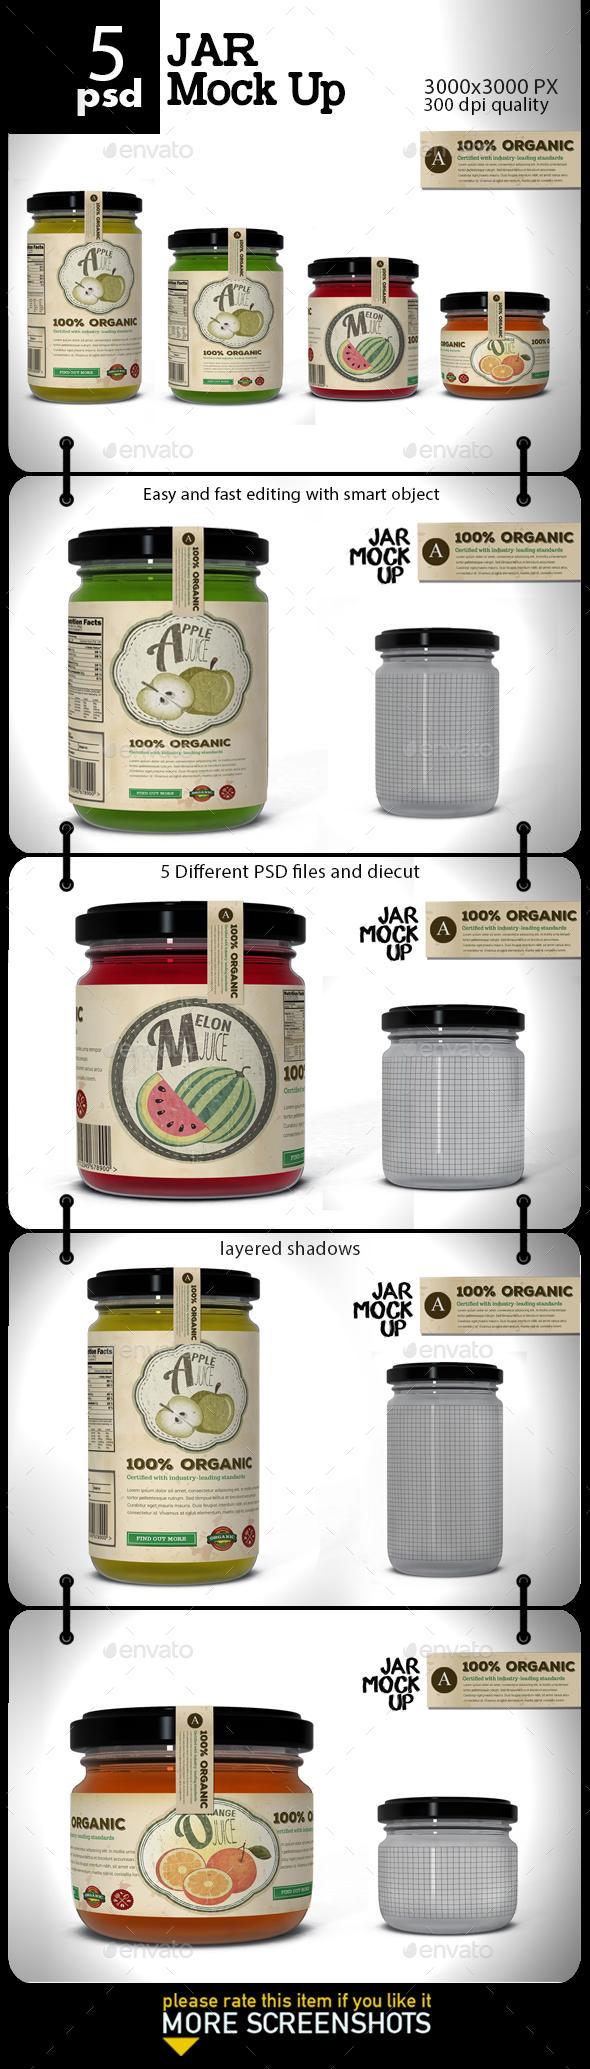 Jar Mock Up - Product Mock-Ups Graphics